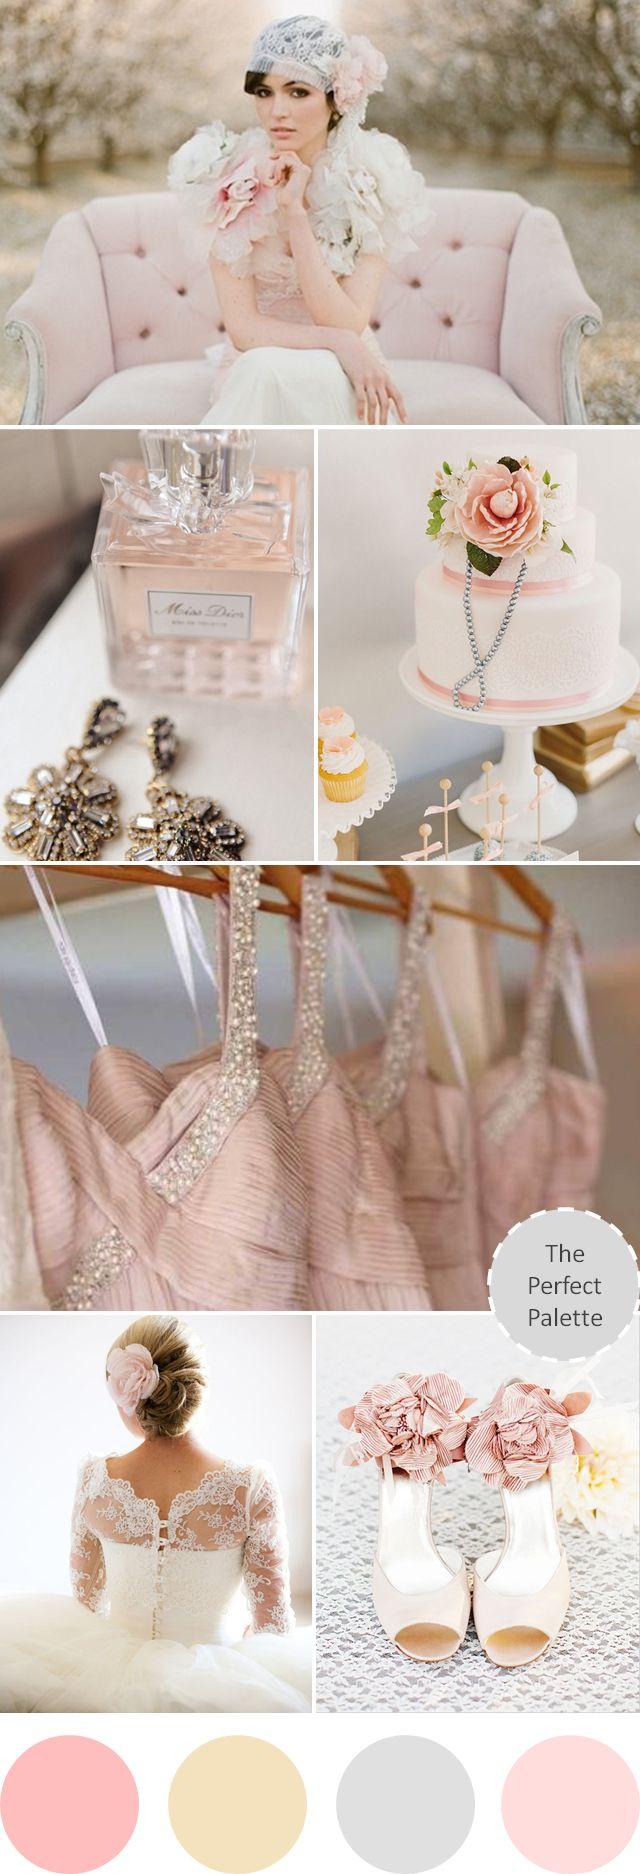 Wedding Colors I Love | Blush Beauty